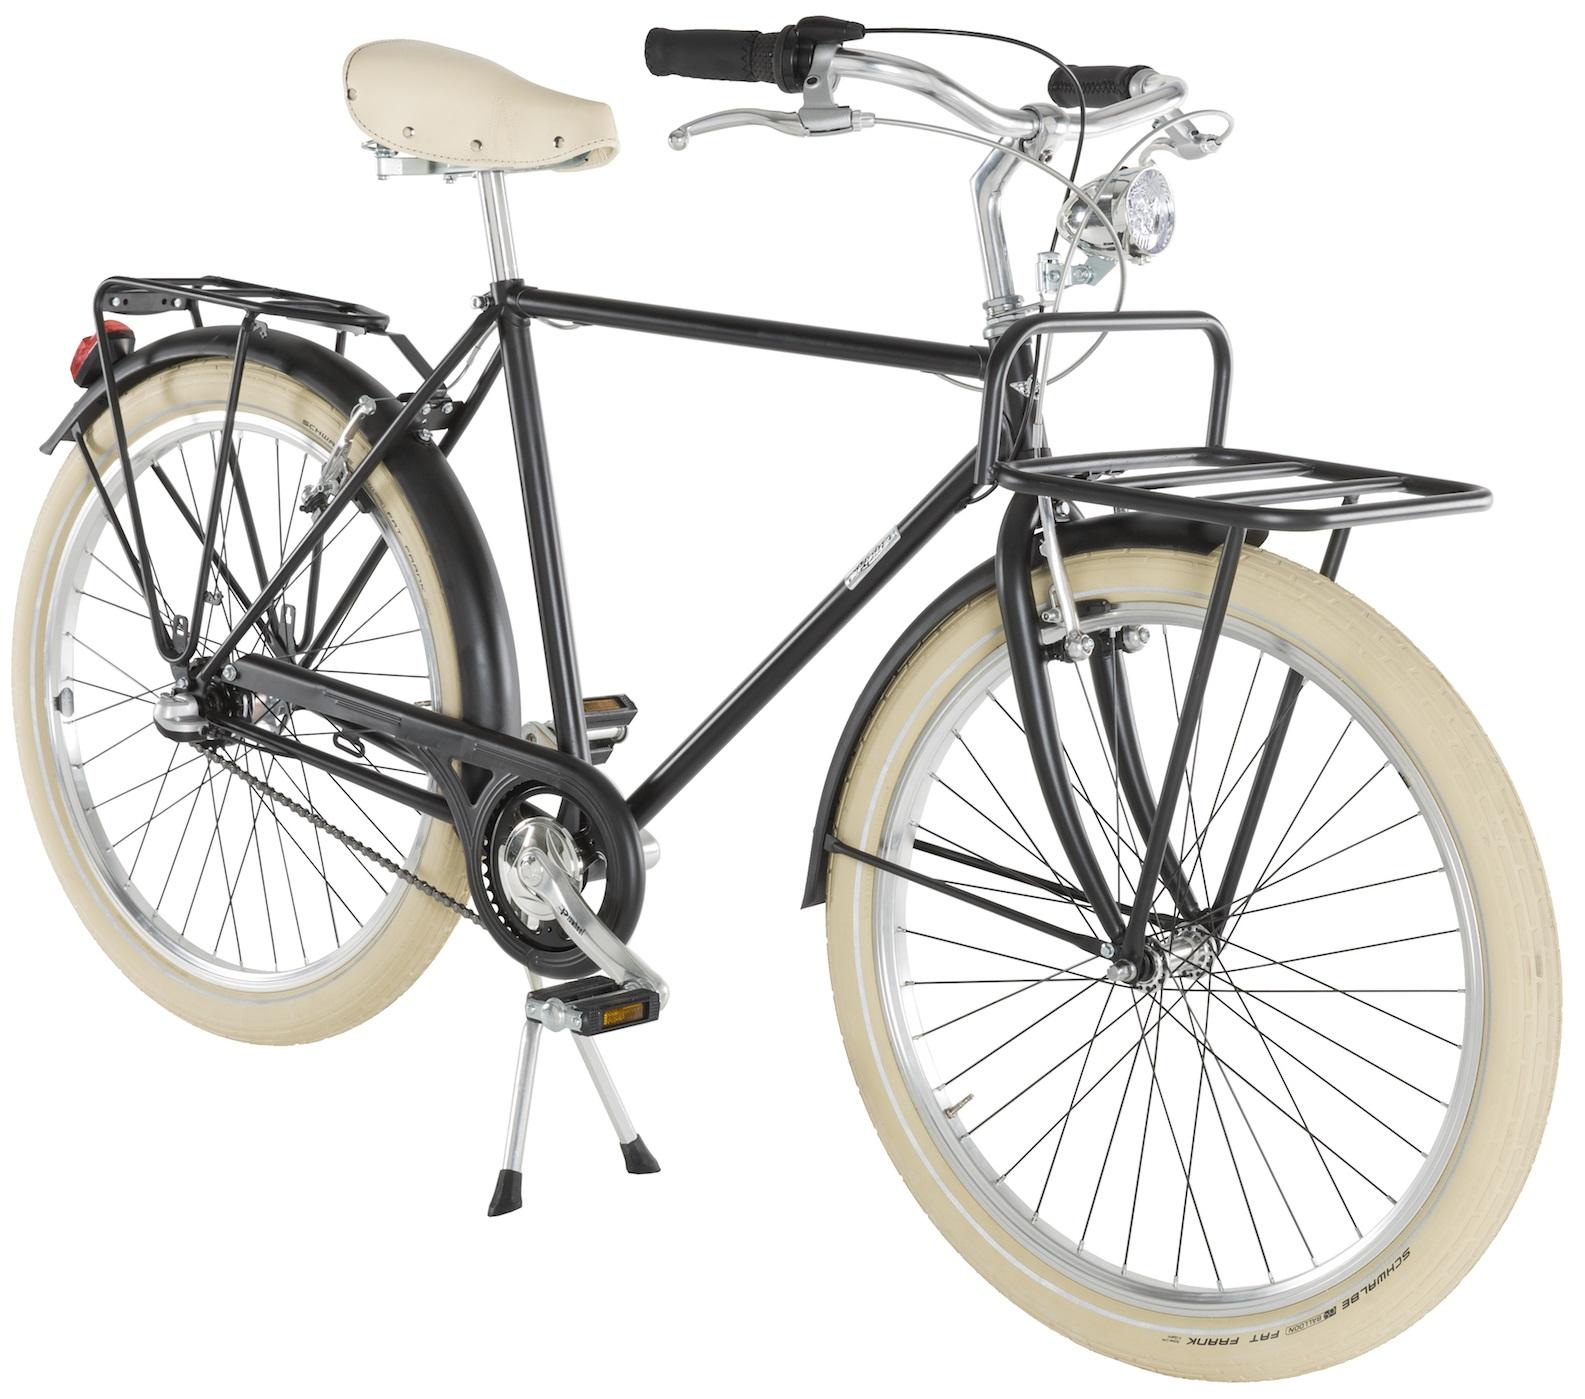 26 zoll herren city fahrrad alpina bruschetta 5 gang. Black Bedroom Furniture Sets. Home Design Ideas